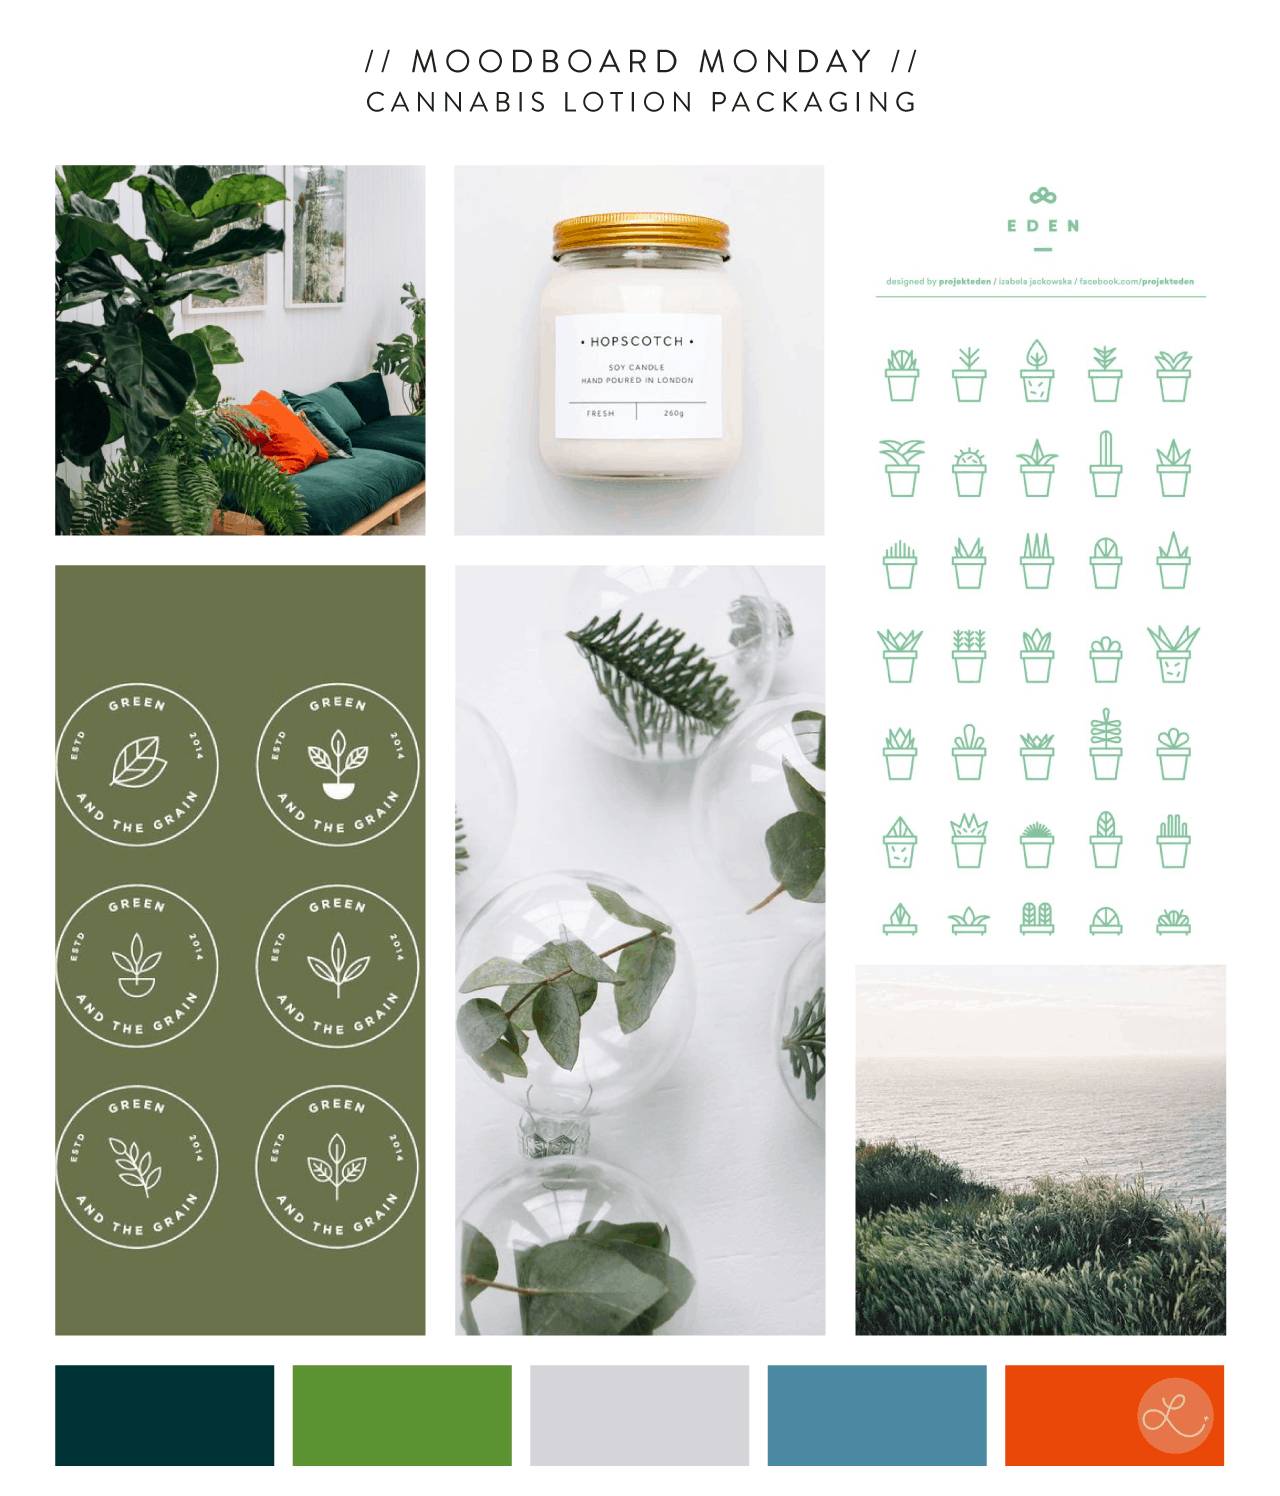 Moodboard Monday- Cannabis Lotion Rebrand  |  Lindsay Goldner Creative